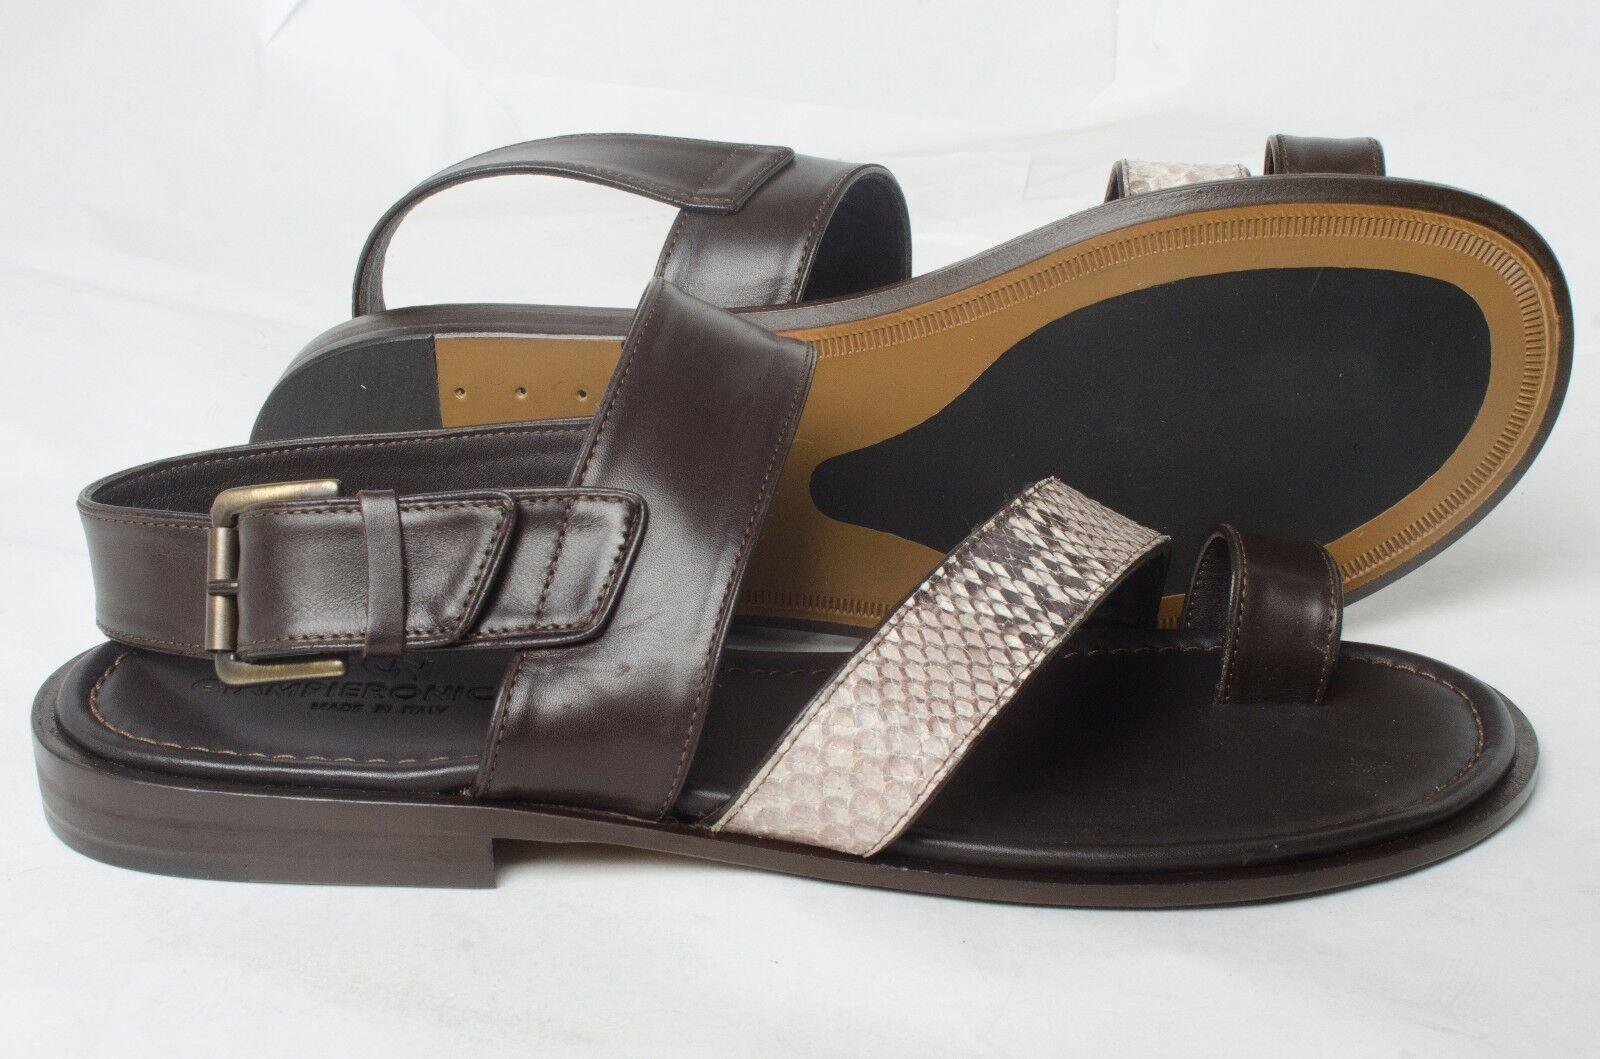 GIAMPIERONICOLA 5076 Italian mens brown with piton print leather strappy sandal